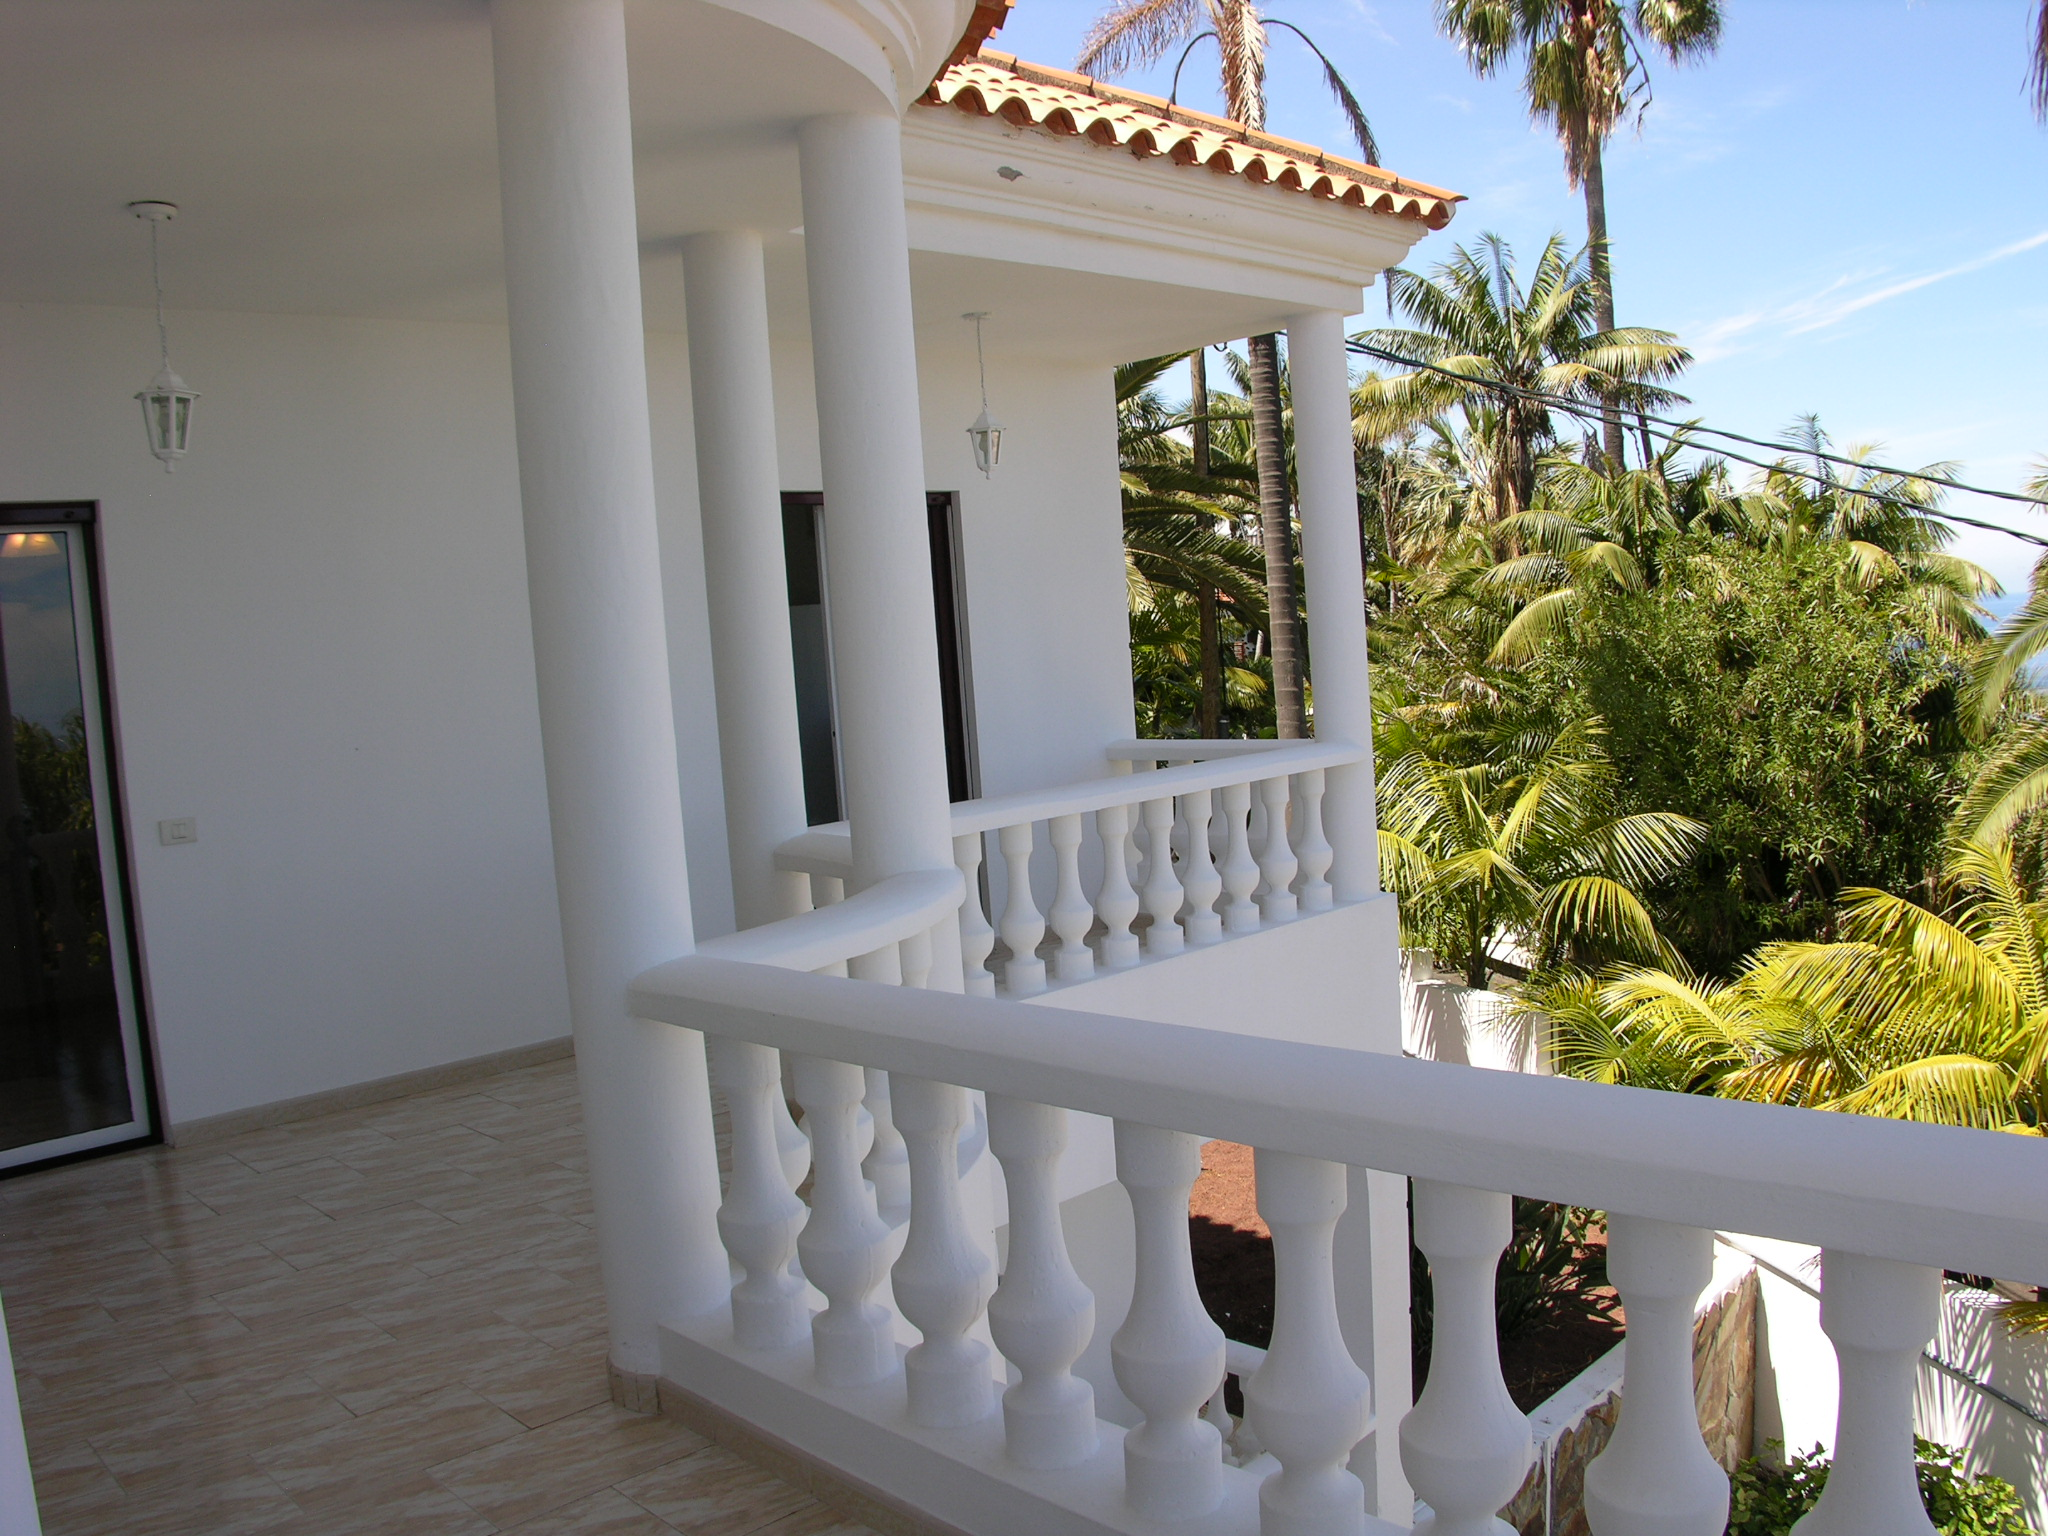 Maison de vacances Villa Vista La Quinta beheizbarer Pool kostenloses WLAN Grill (2124407), Santa Ursula, Ténérife, Iles Canaries, Espagne, image 3